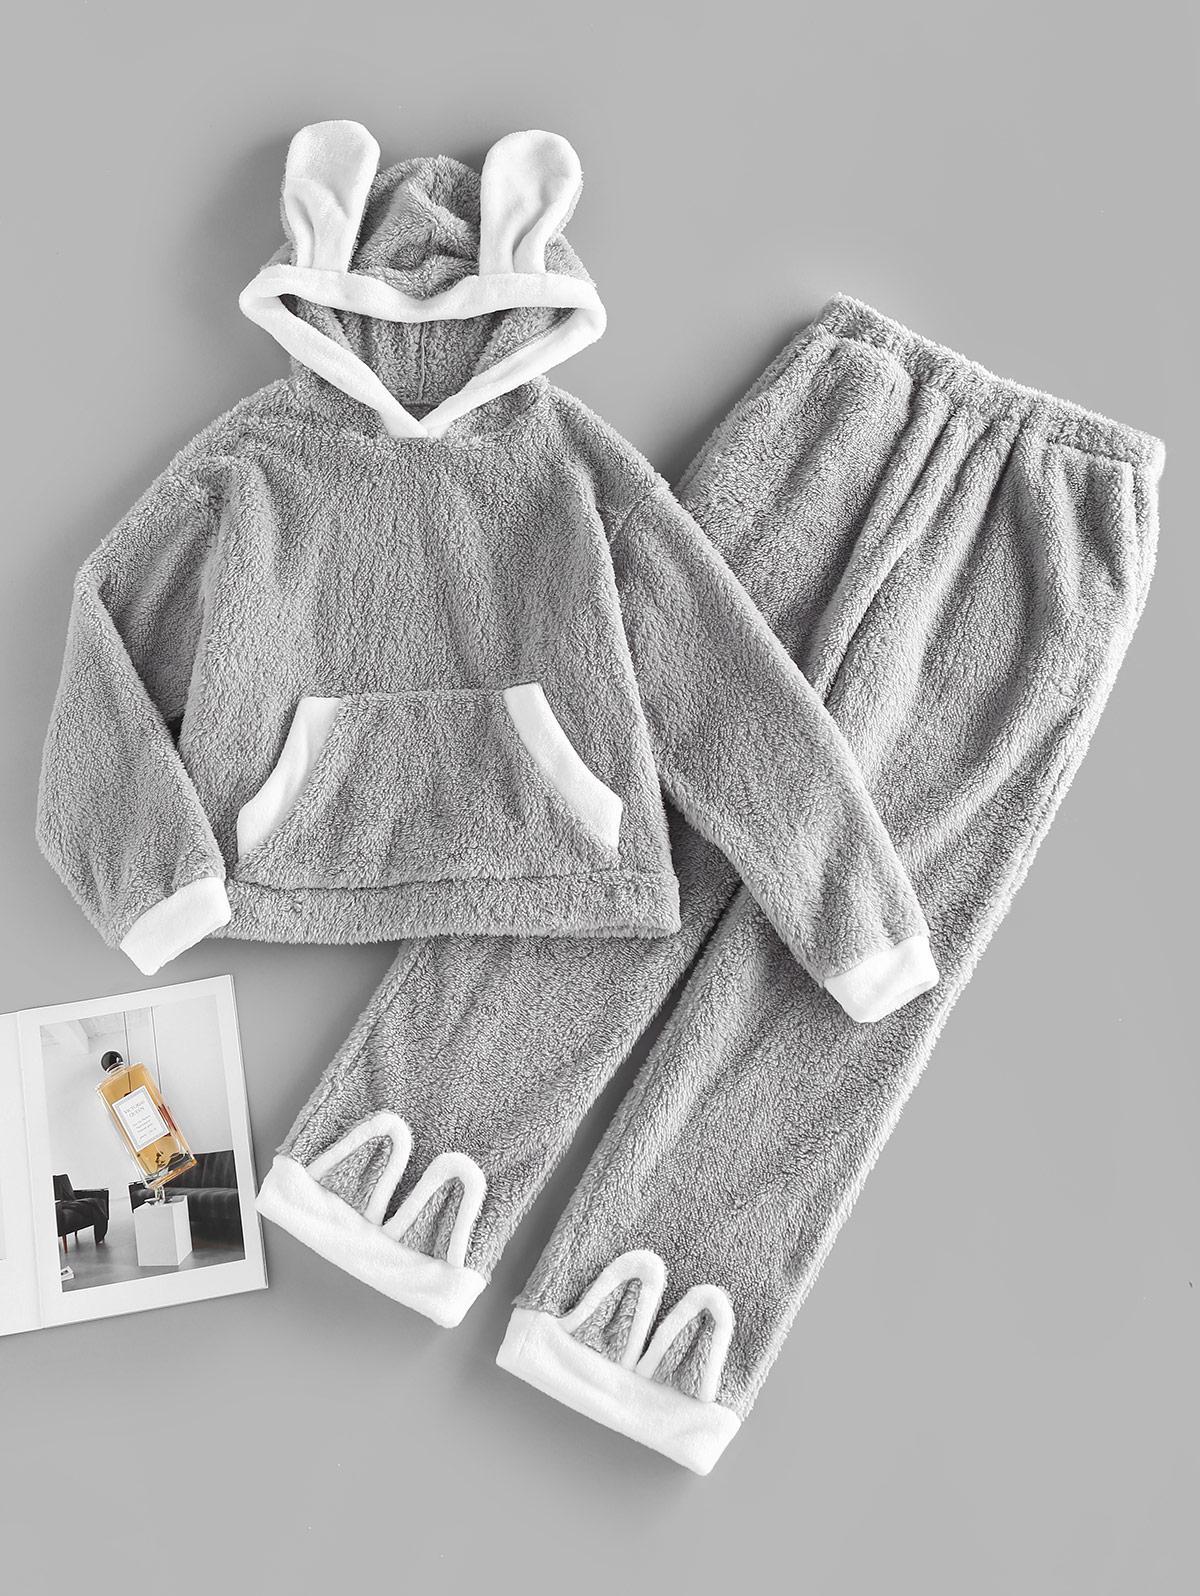 ZAFUL Kangaroo Pocket Hooded Plush Colorblock Bunny Pajama Pants Set